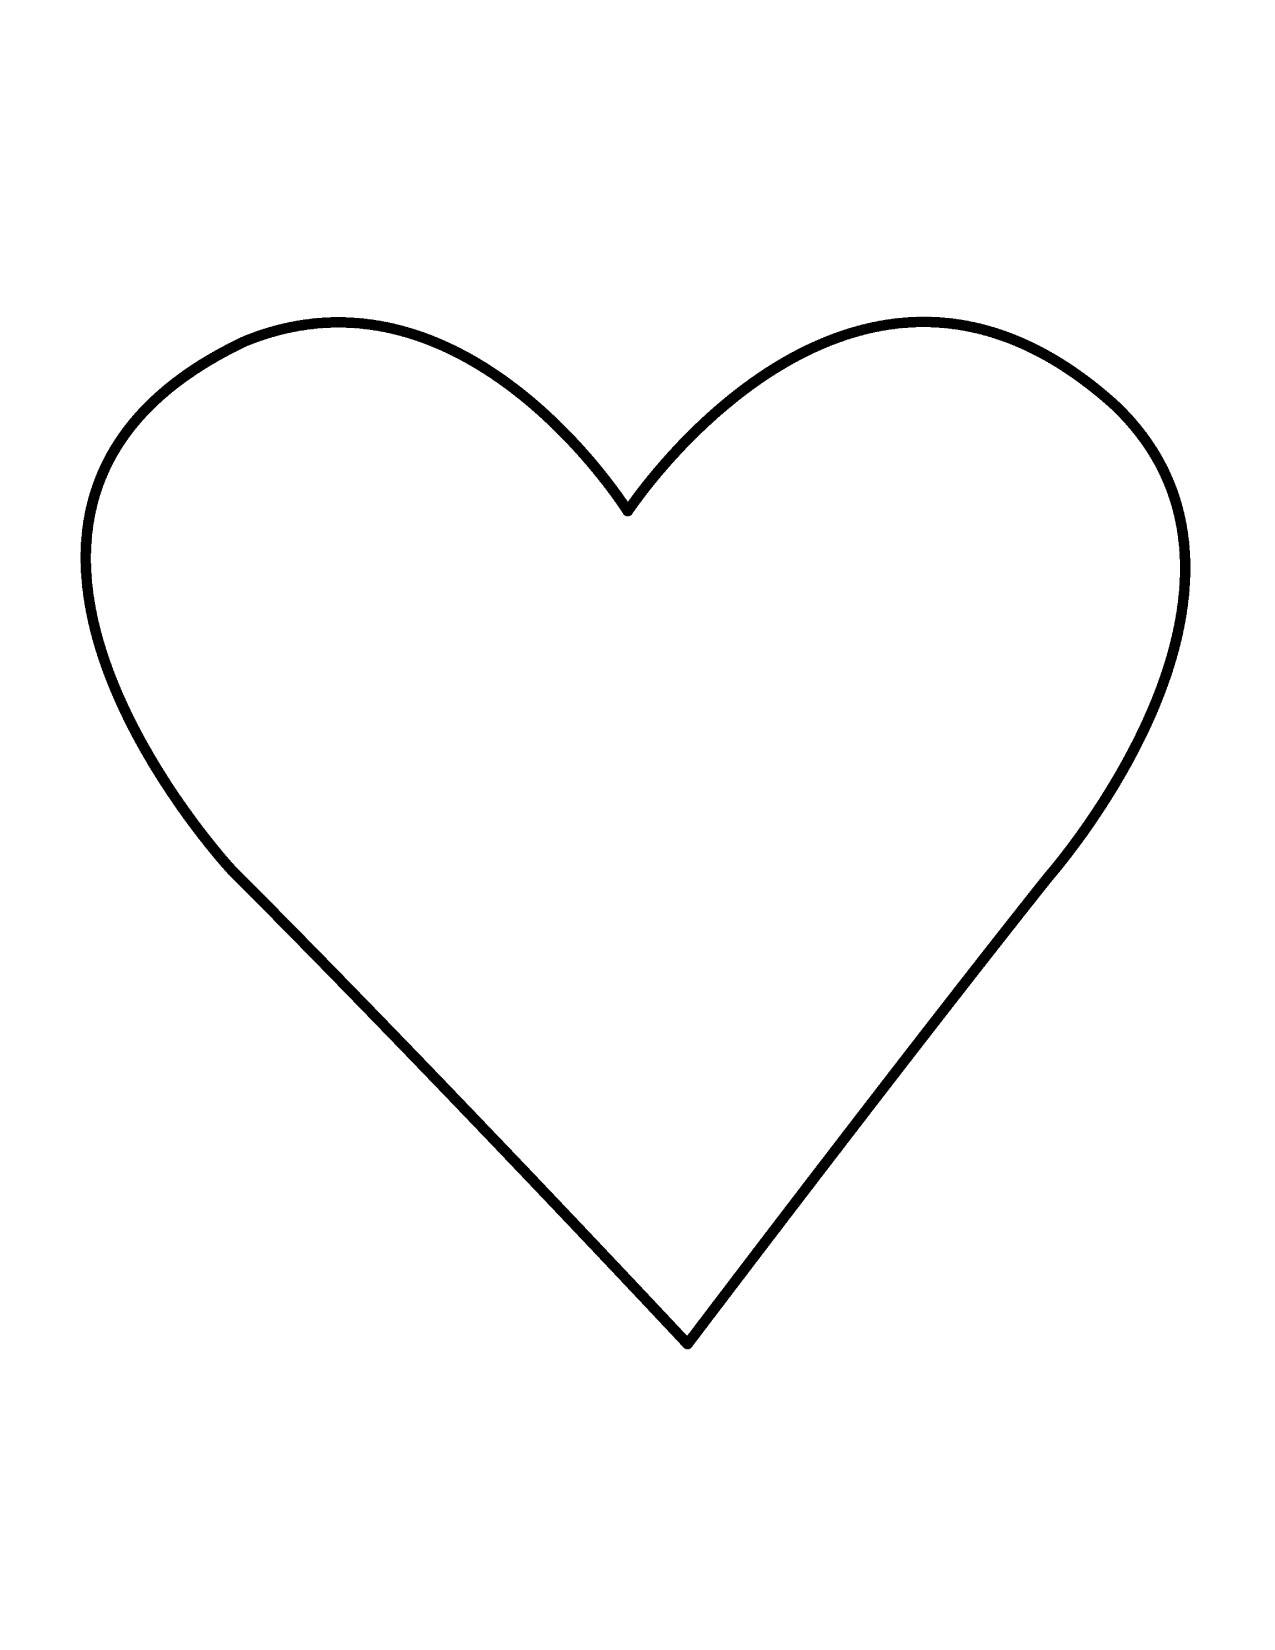 Clip Art Hearts Outline | Clipart Panda - Free Clipart Images